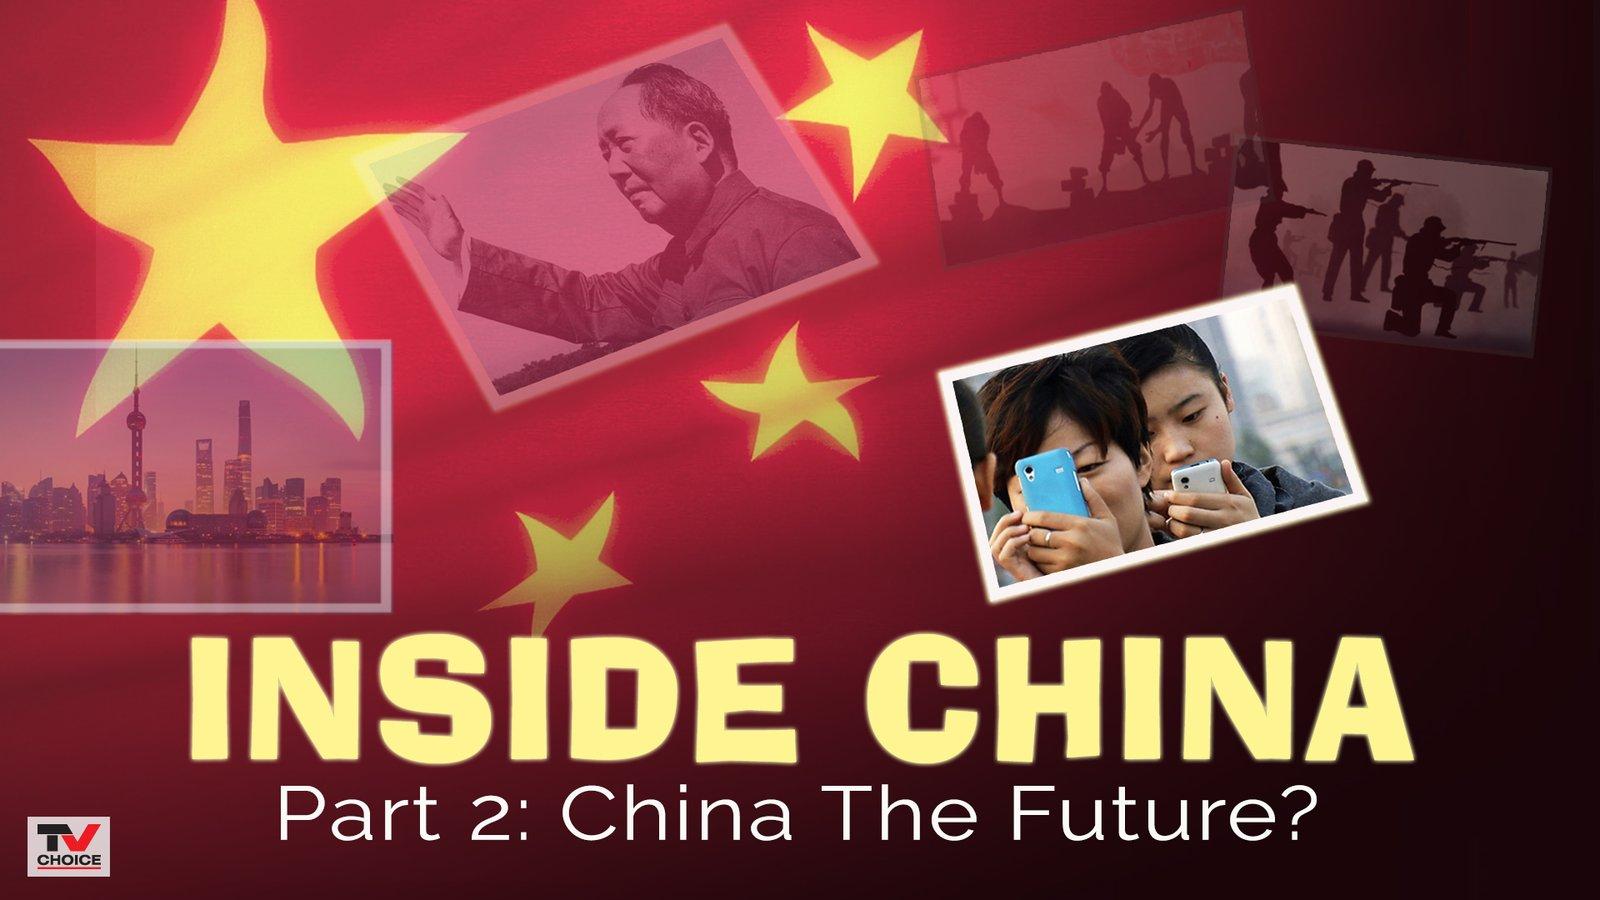 Inside China 2: China The Future?